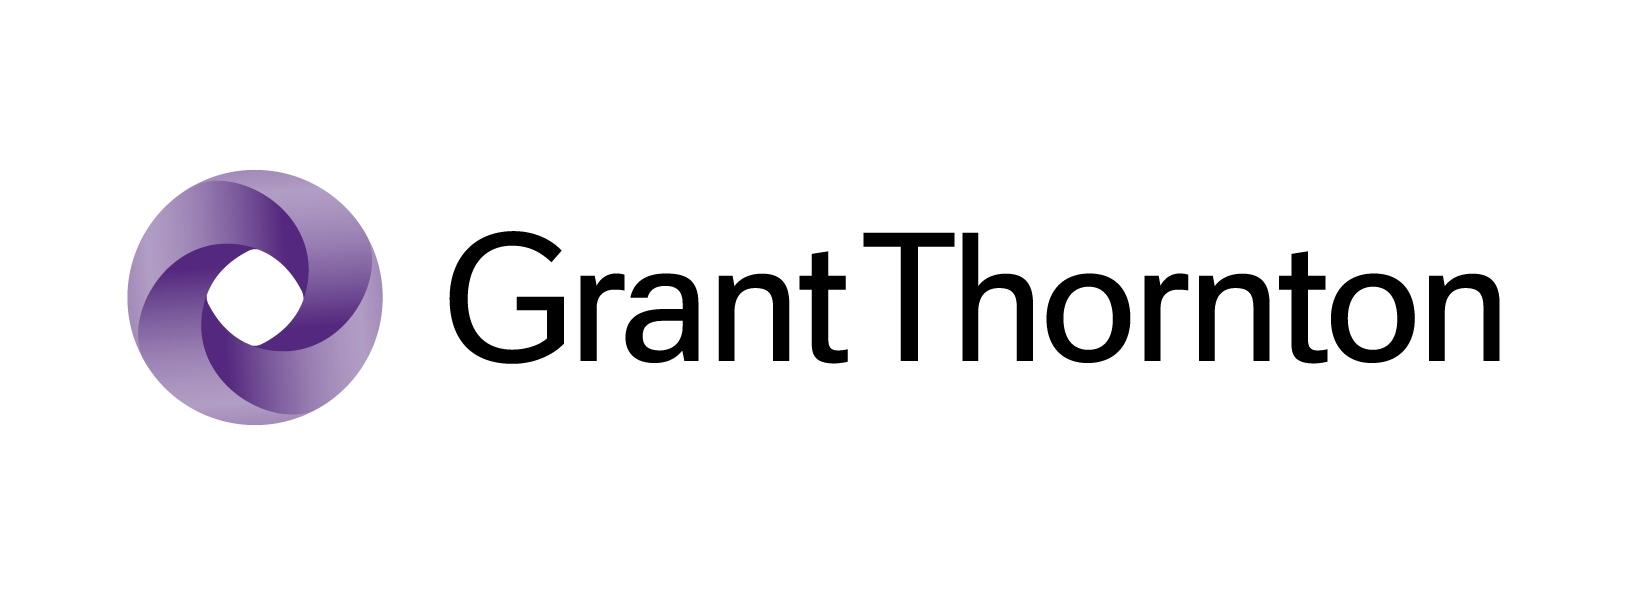 Grant%20Thornton_0[1].JPG